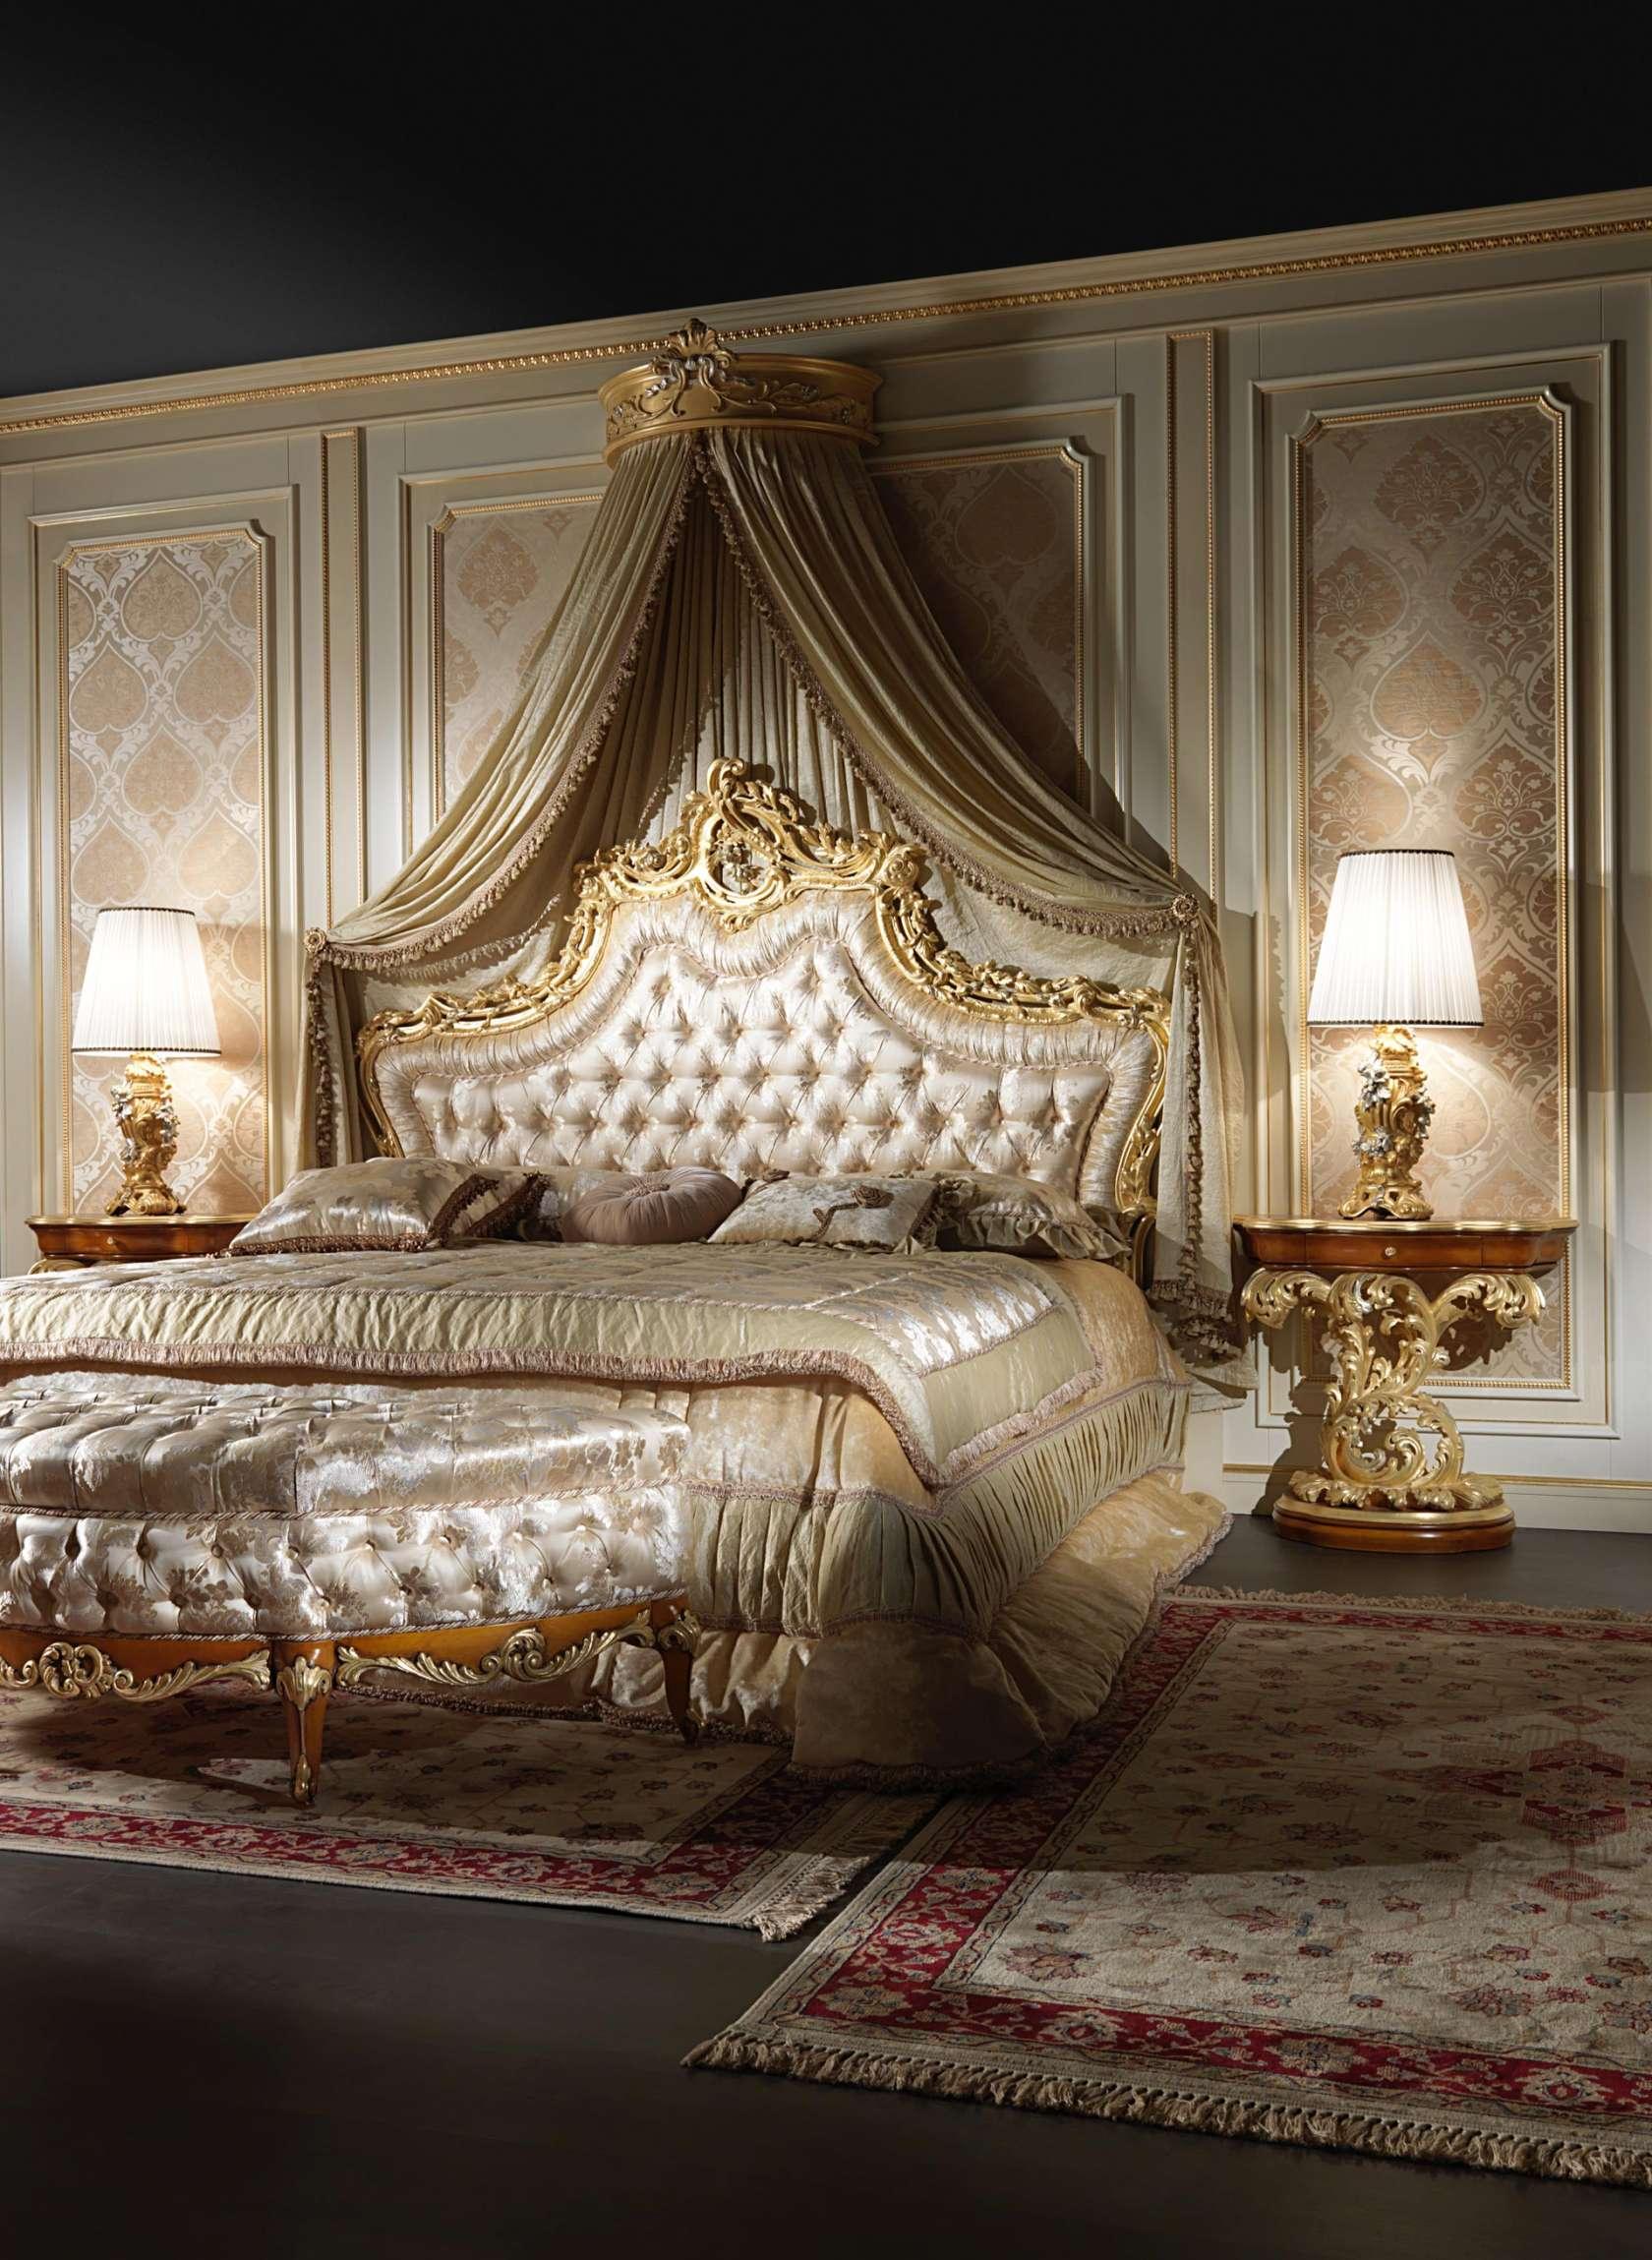 Charmant 2012 Roman Baroque Style. Elegant Baroque Bed